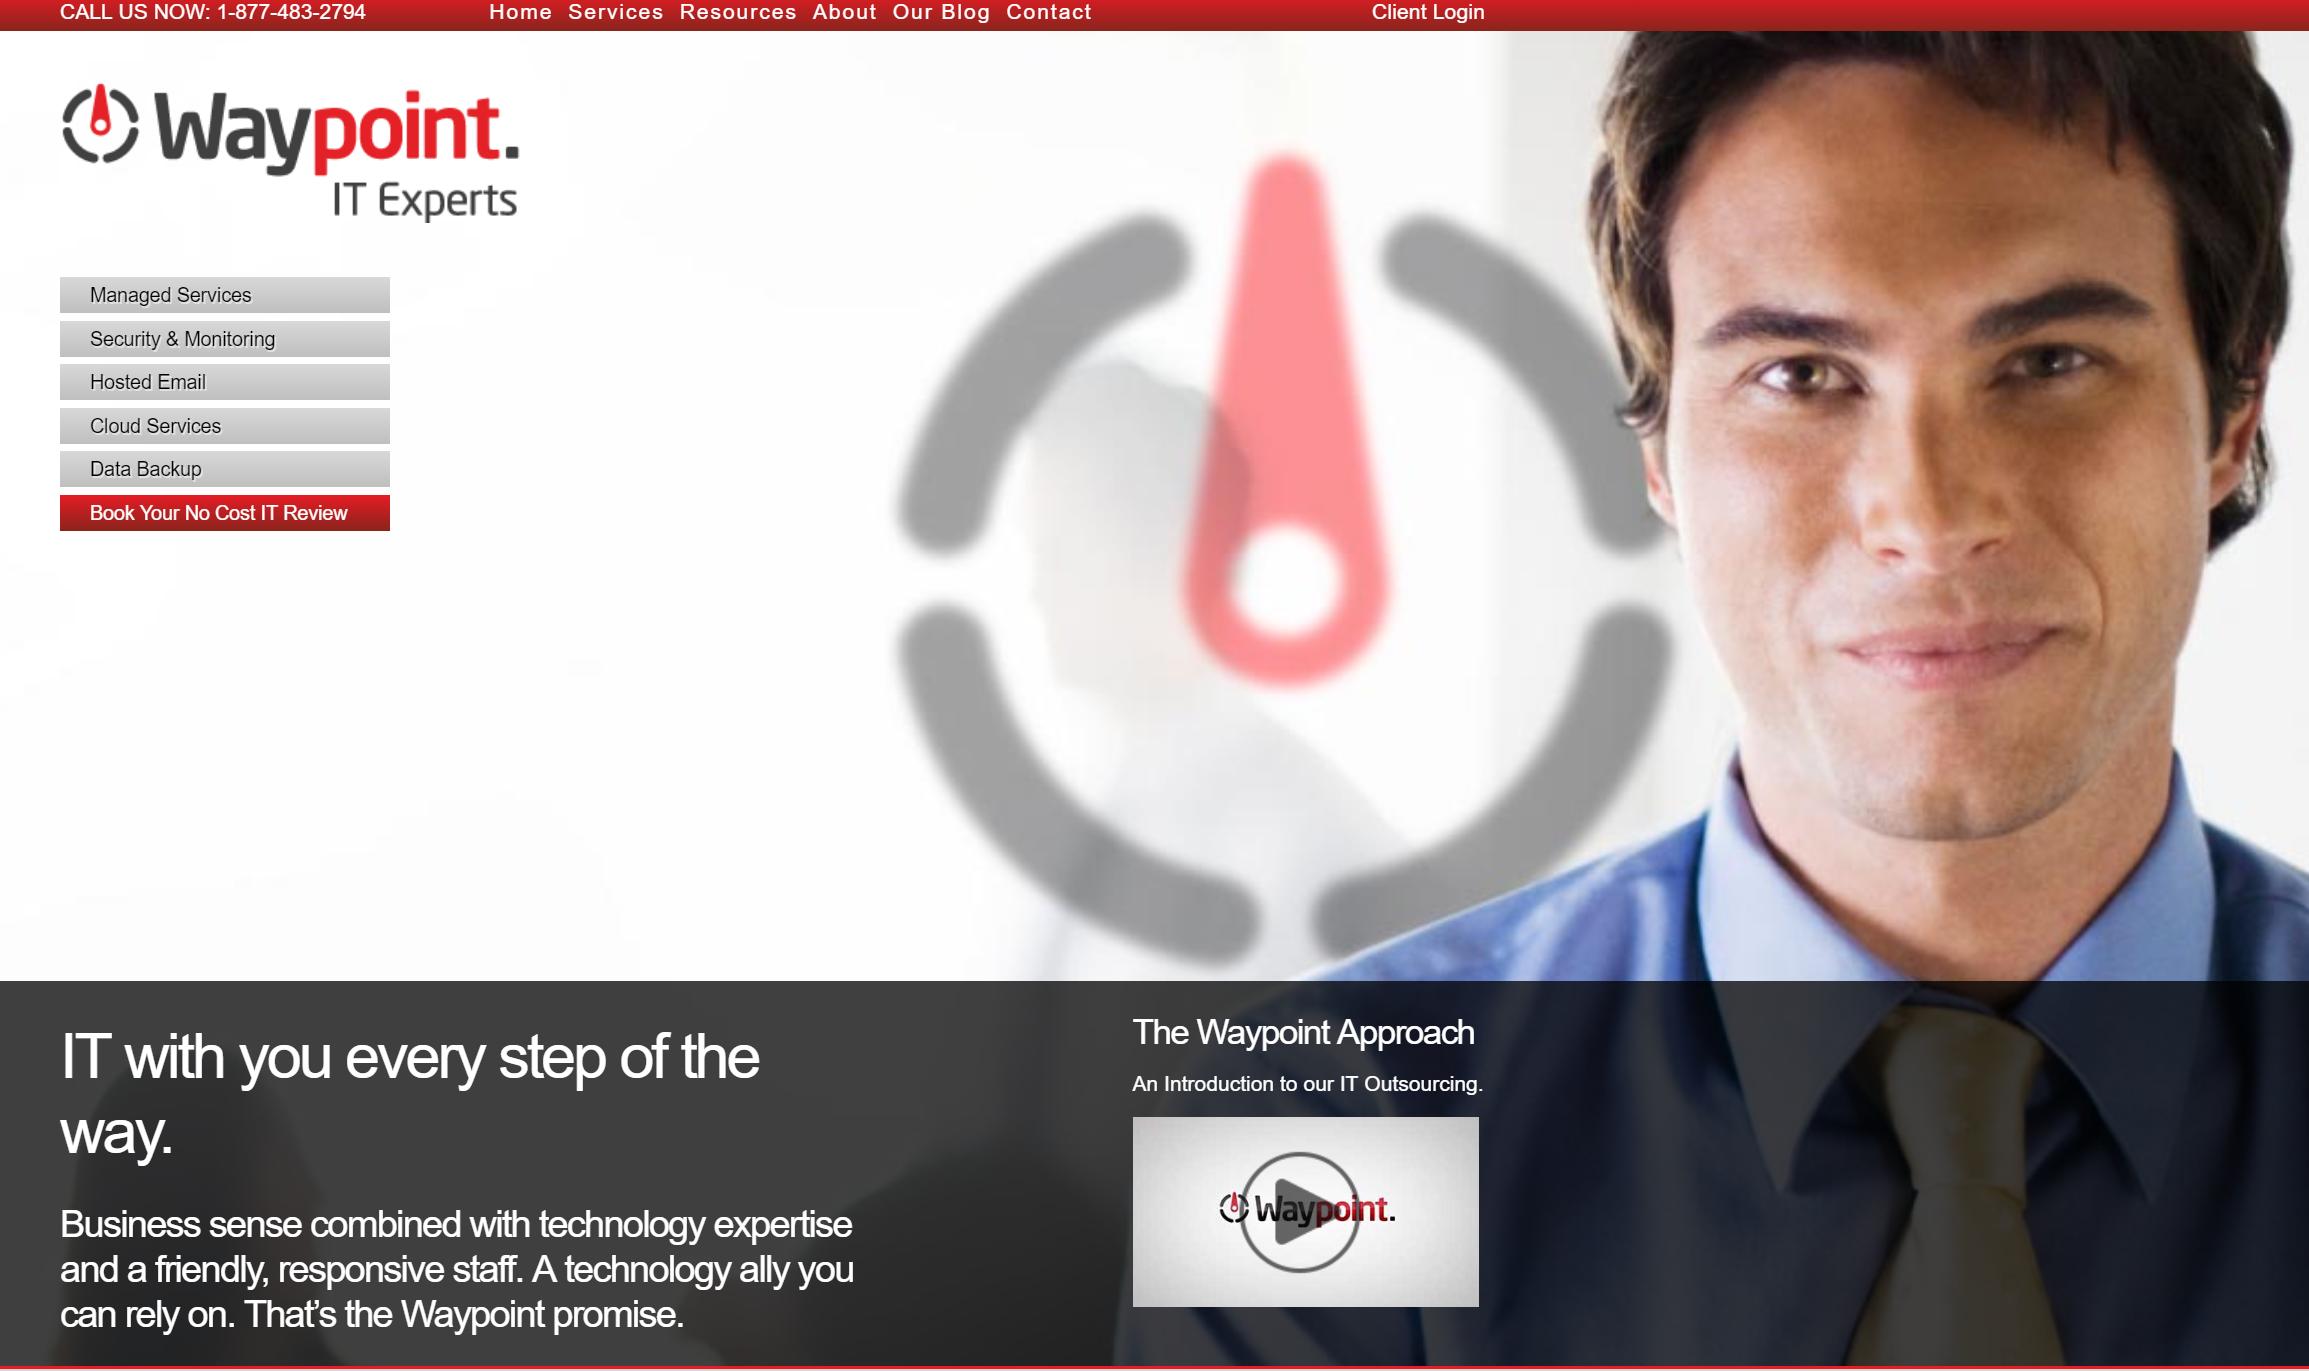 waypoint website